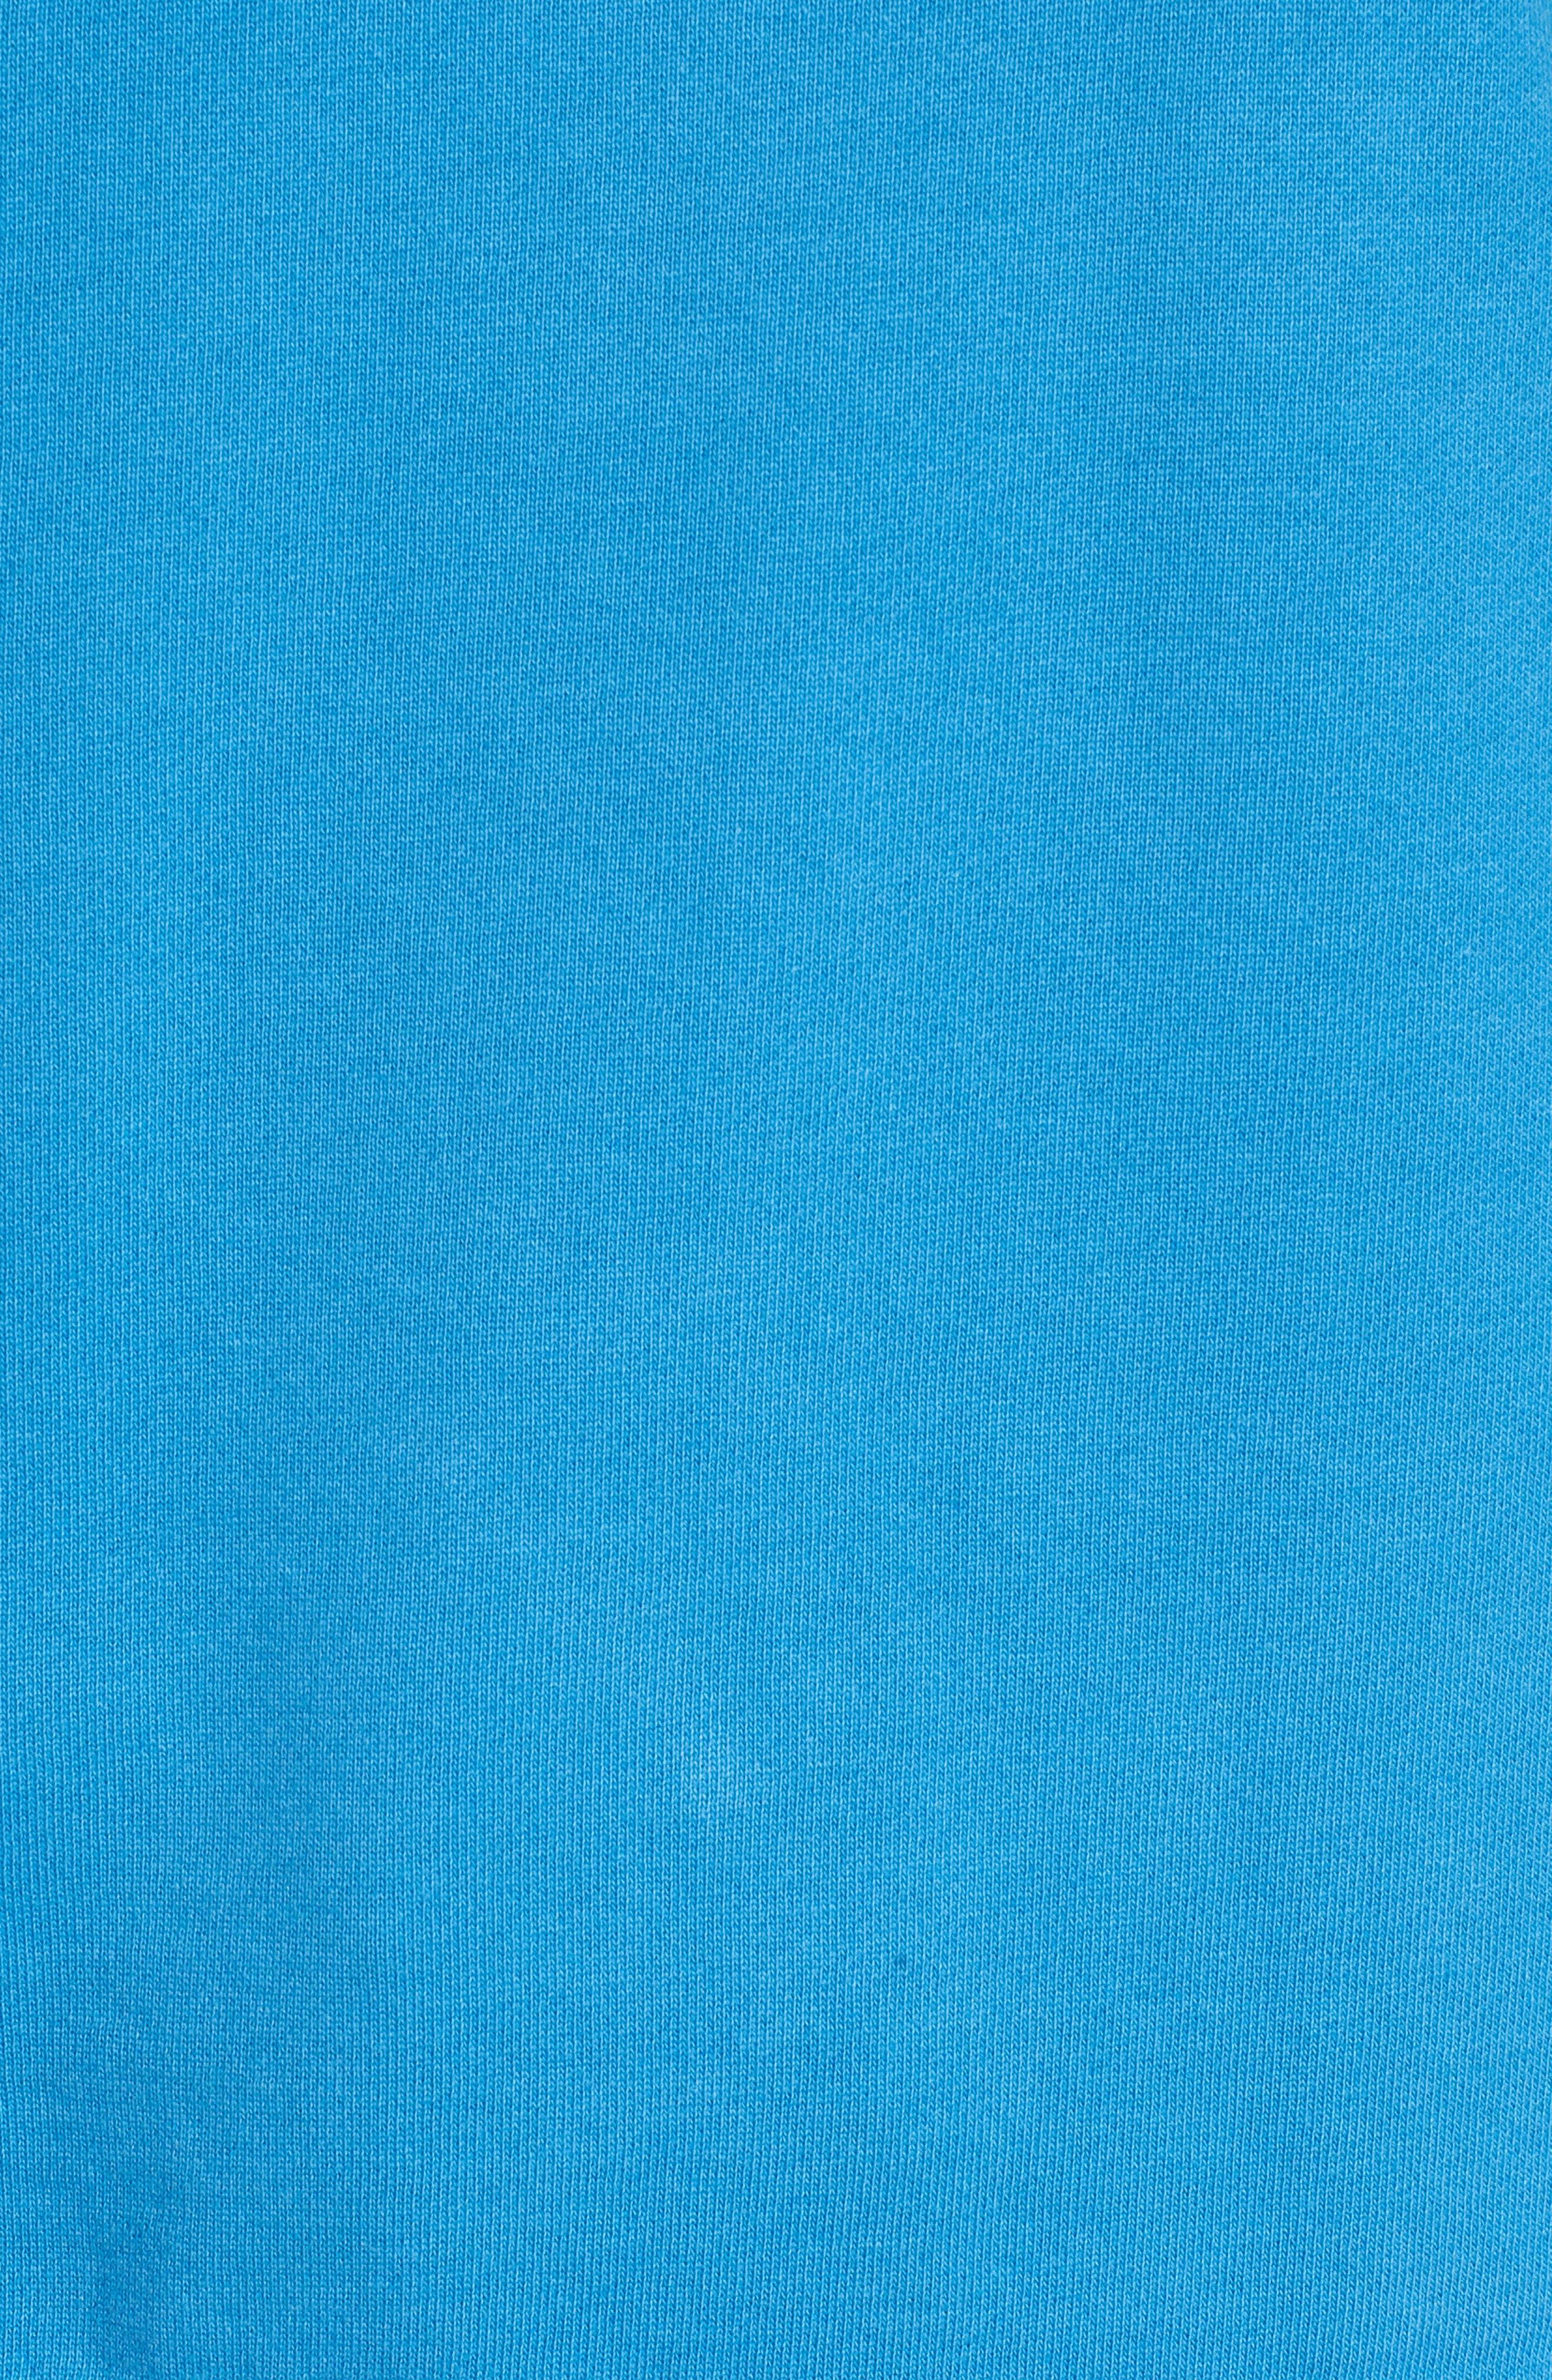 Kabel Graphic Sweatshirt,                             Alternate thumbnail 5, color,                             DEEP WATER